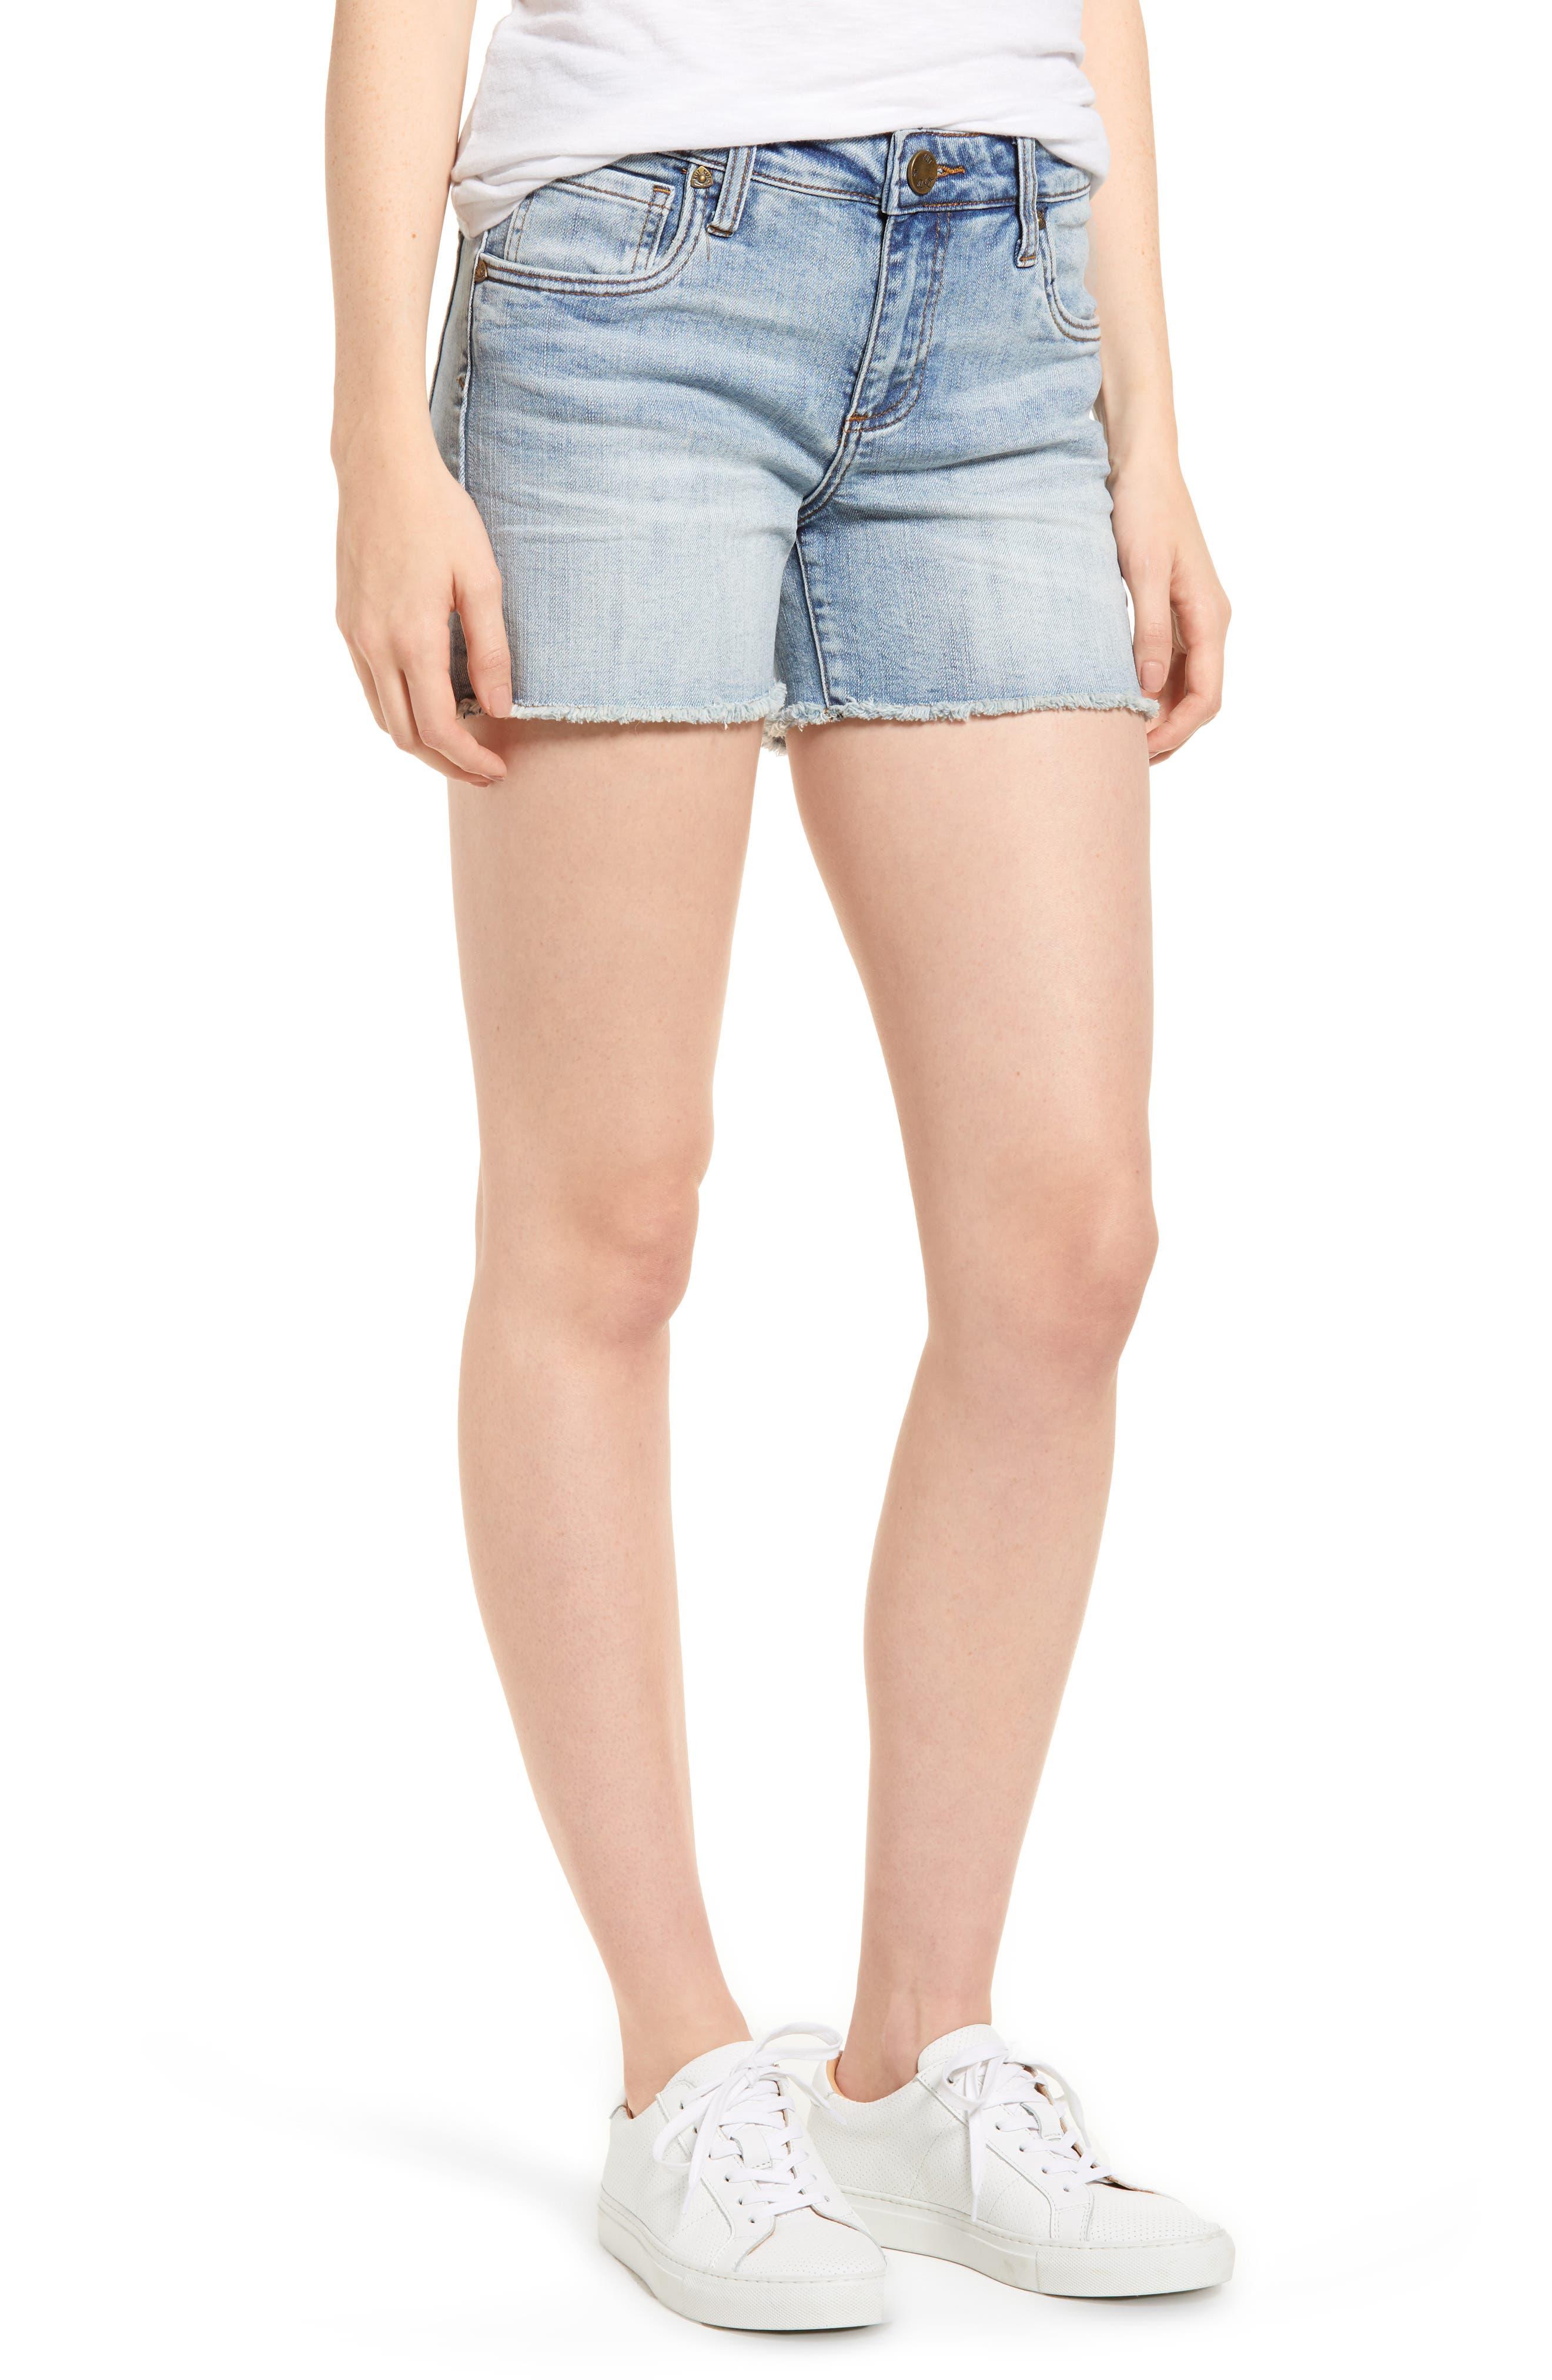 Gidget Cutoff Denim Shorts,                         Main,                         color, 470